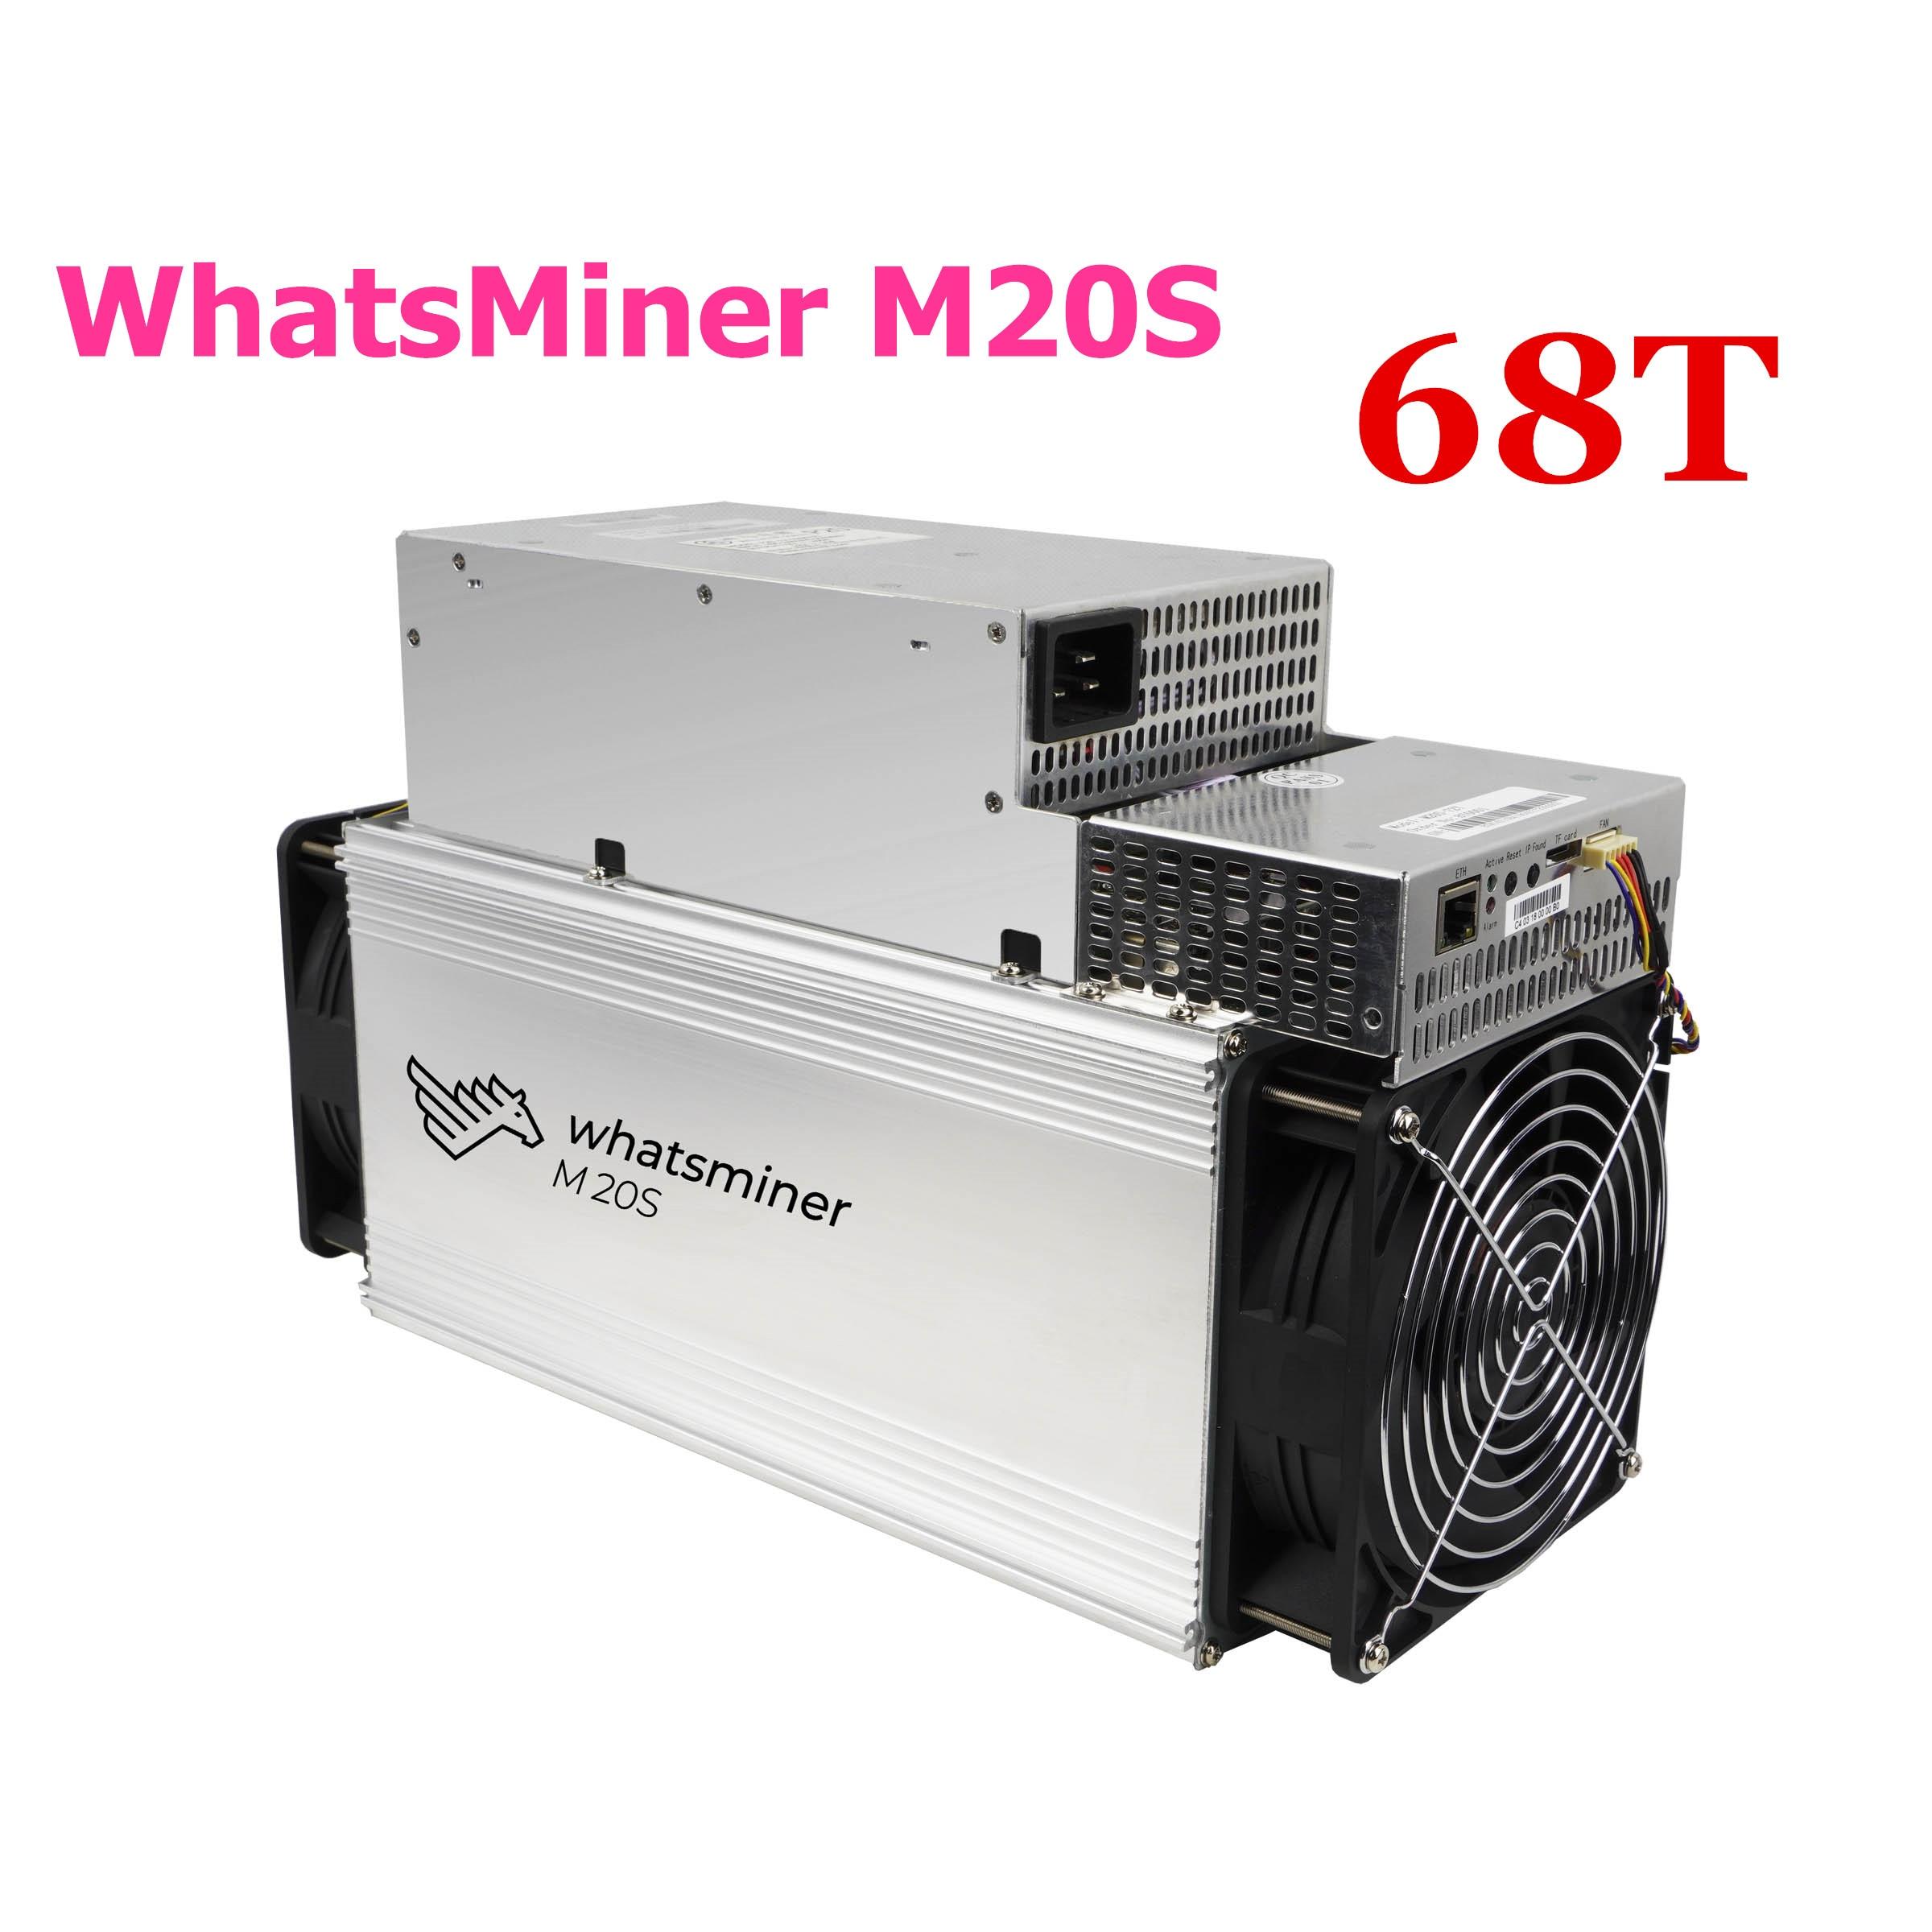 BTC BCH Miner WhatsMiner M20S 68T Bitcoin Miner With PSU Better Than WhatsMiner M3 M3X M21 M21S Antminer S9 T9+ S15 S17 T17 S17e